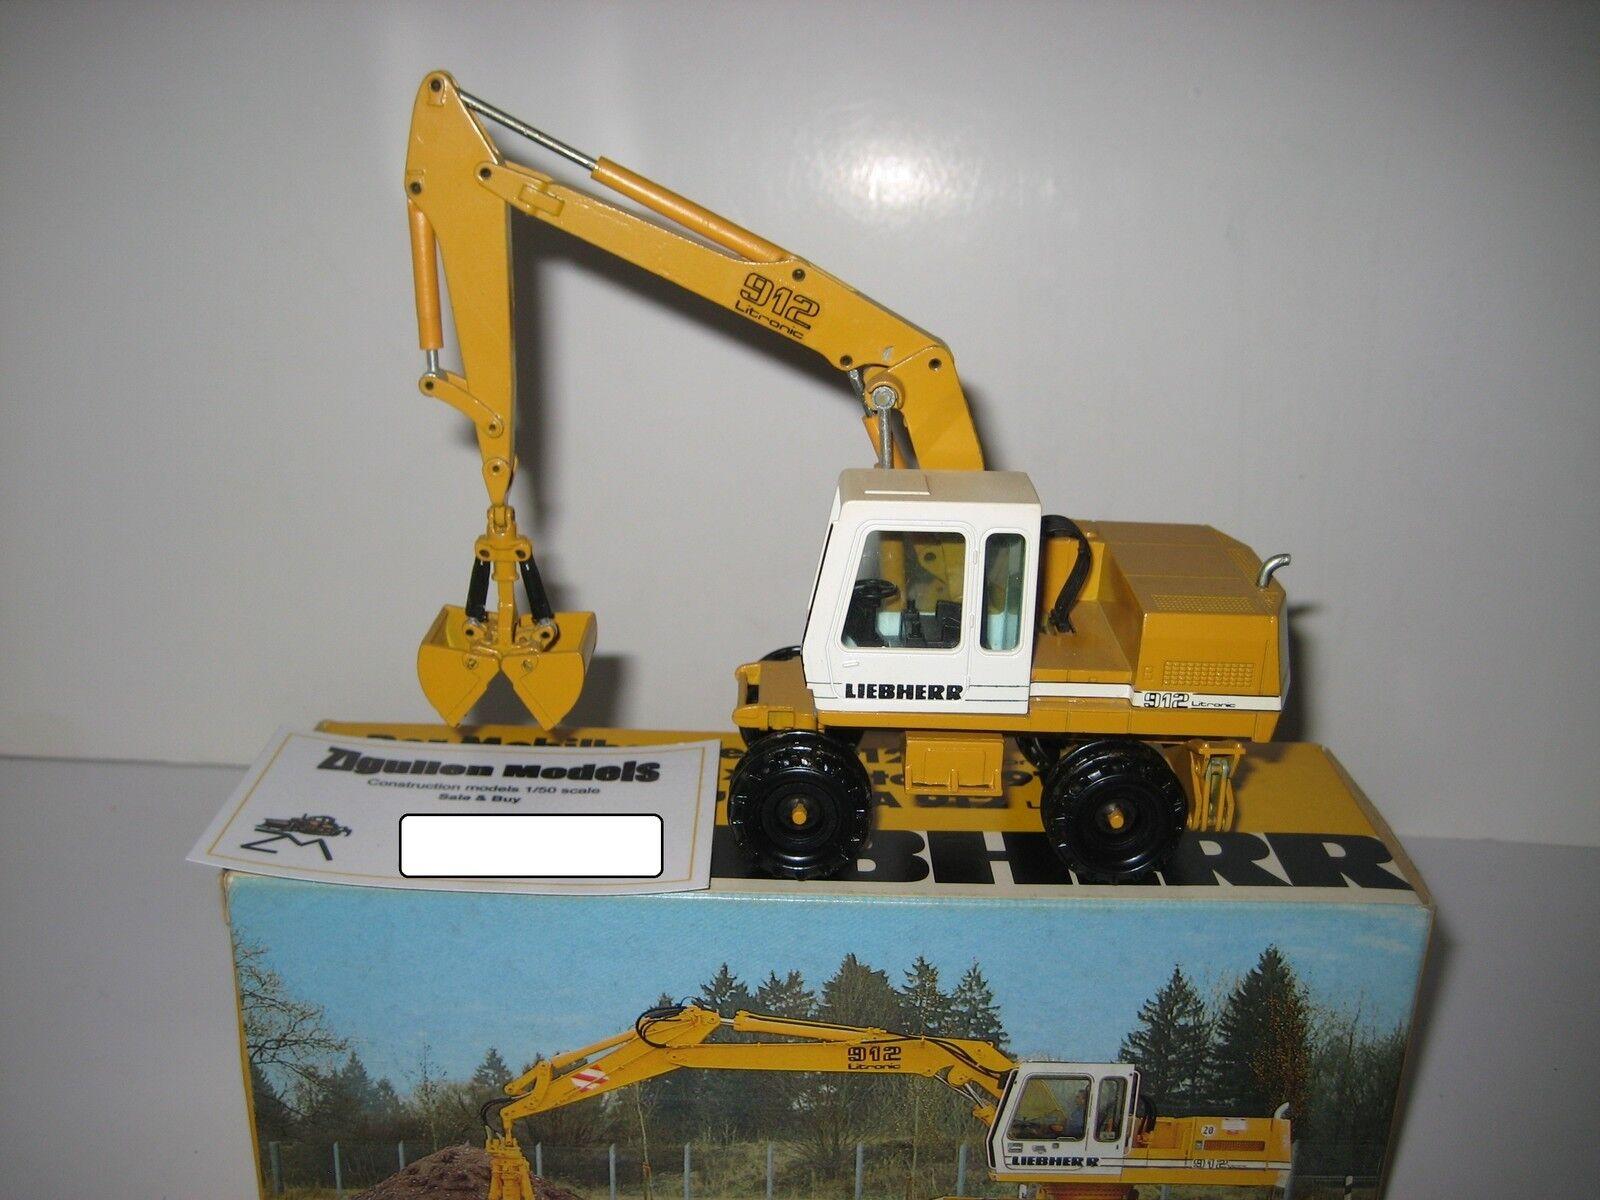 Liebherr A 912 912 912 Excavateurs Pince Mobile #2830.1 CONRAD 1:50 NEUF dans sa boîte | Terrific Value  f6cfbb